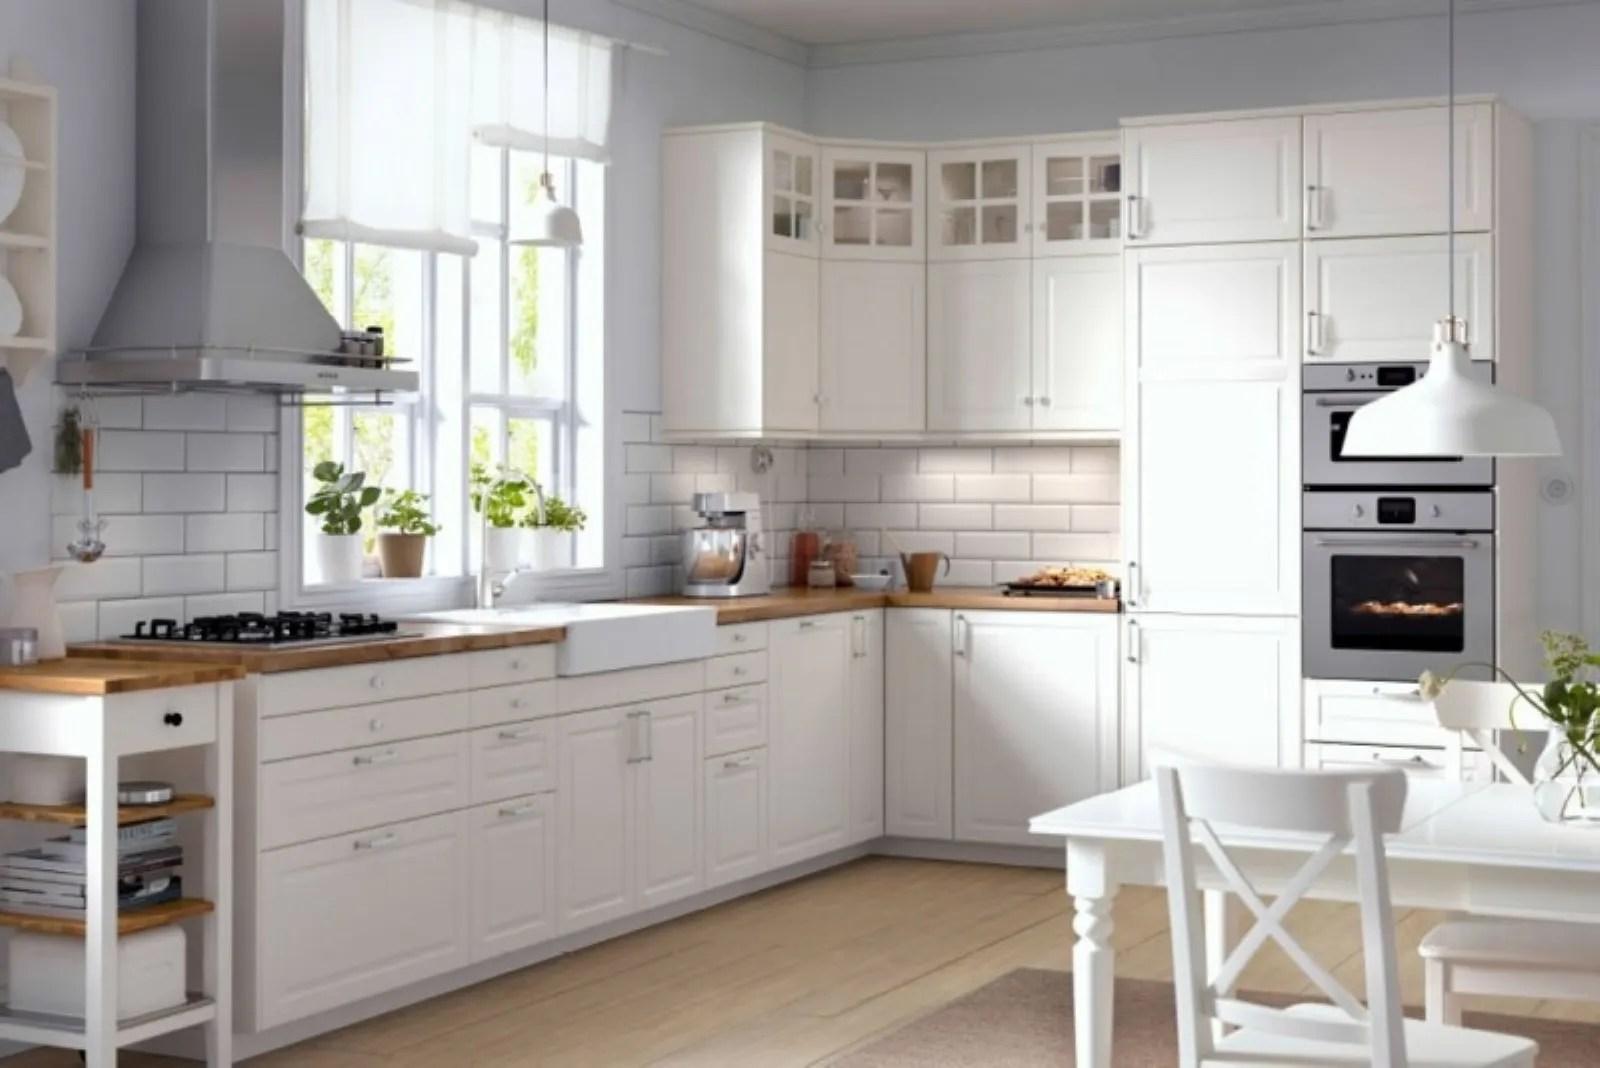 Clara cucine dispone di una vasta gamma di motorizzazioni ed aperture automatizzate per pensili e basi.i sistemi di apertura motorizzata sono stati progettat. Pensili Cucina Ikea Per Cucine Moderne